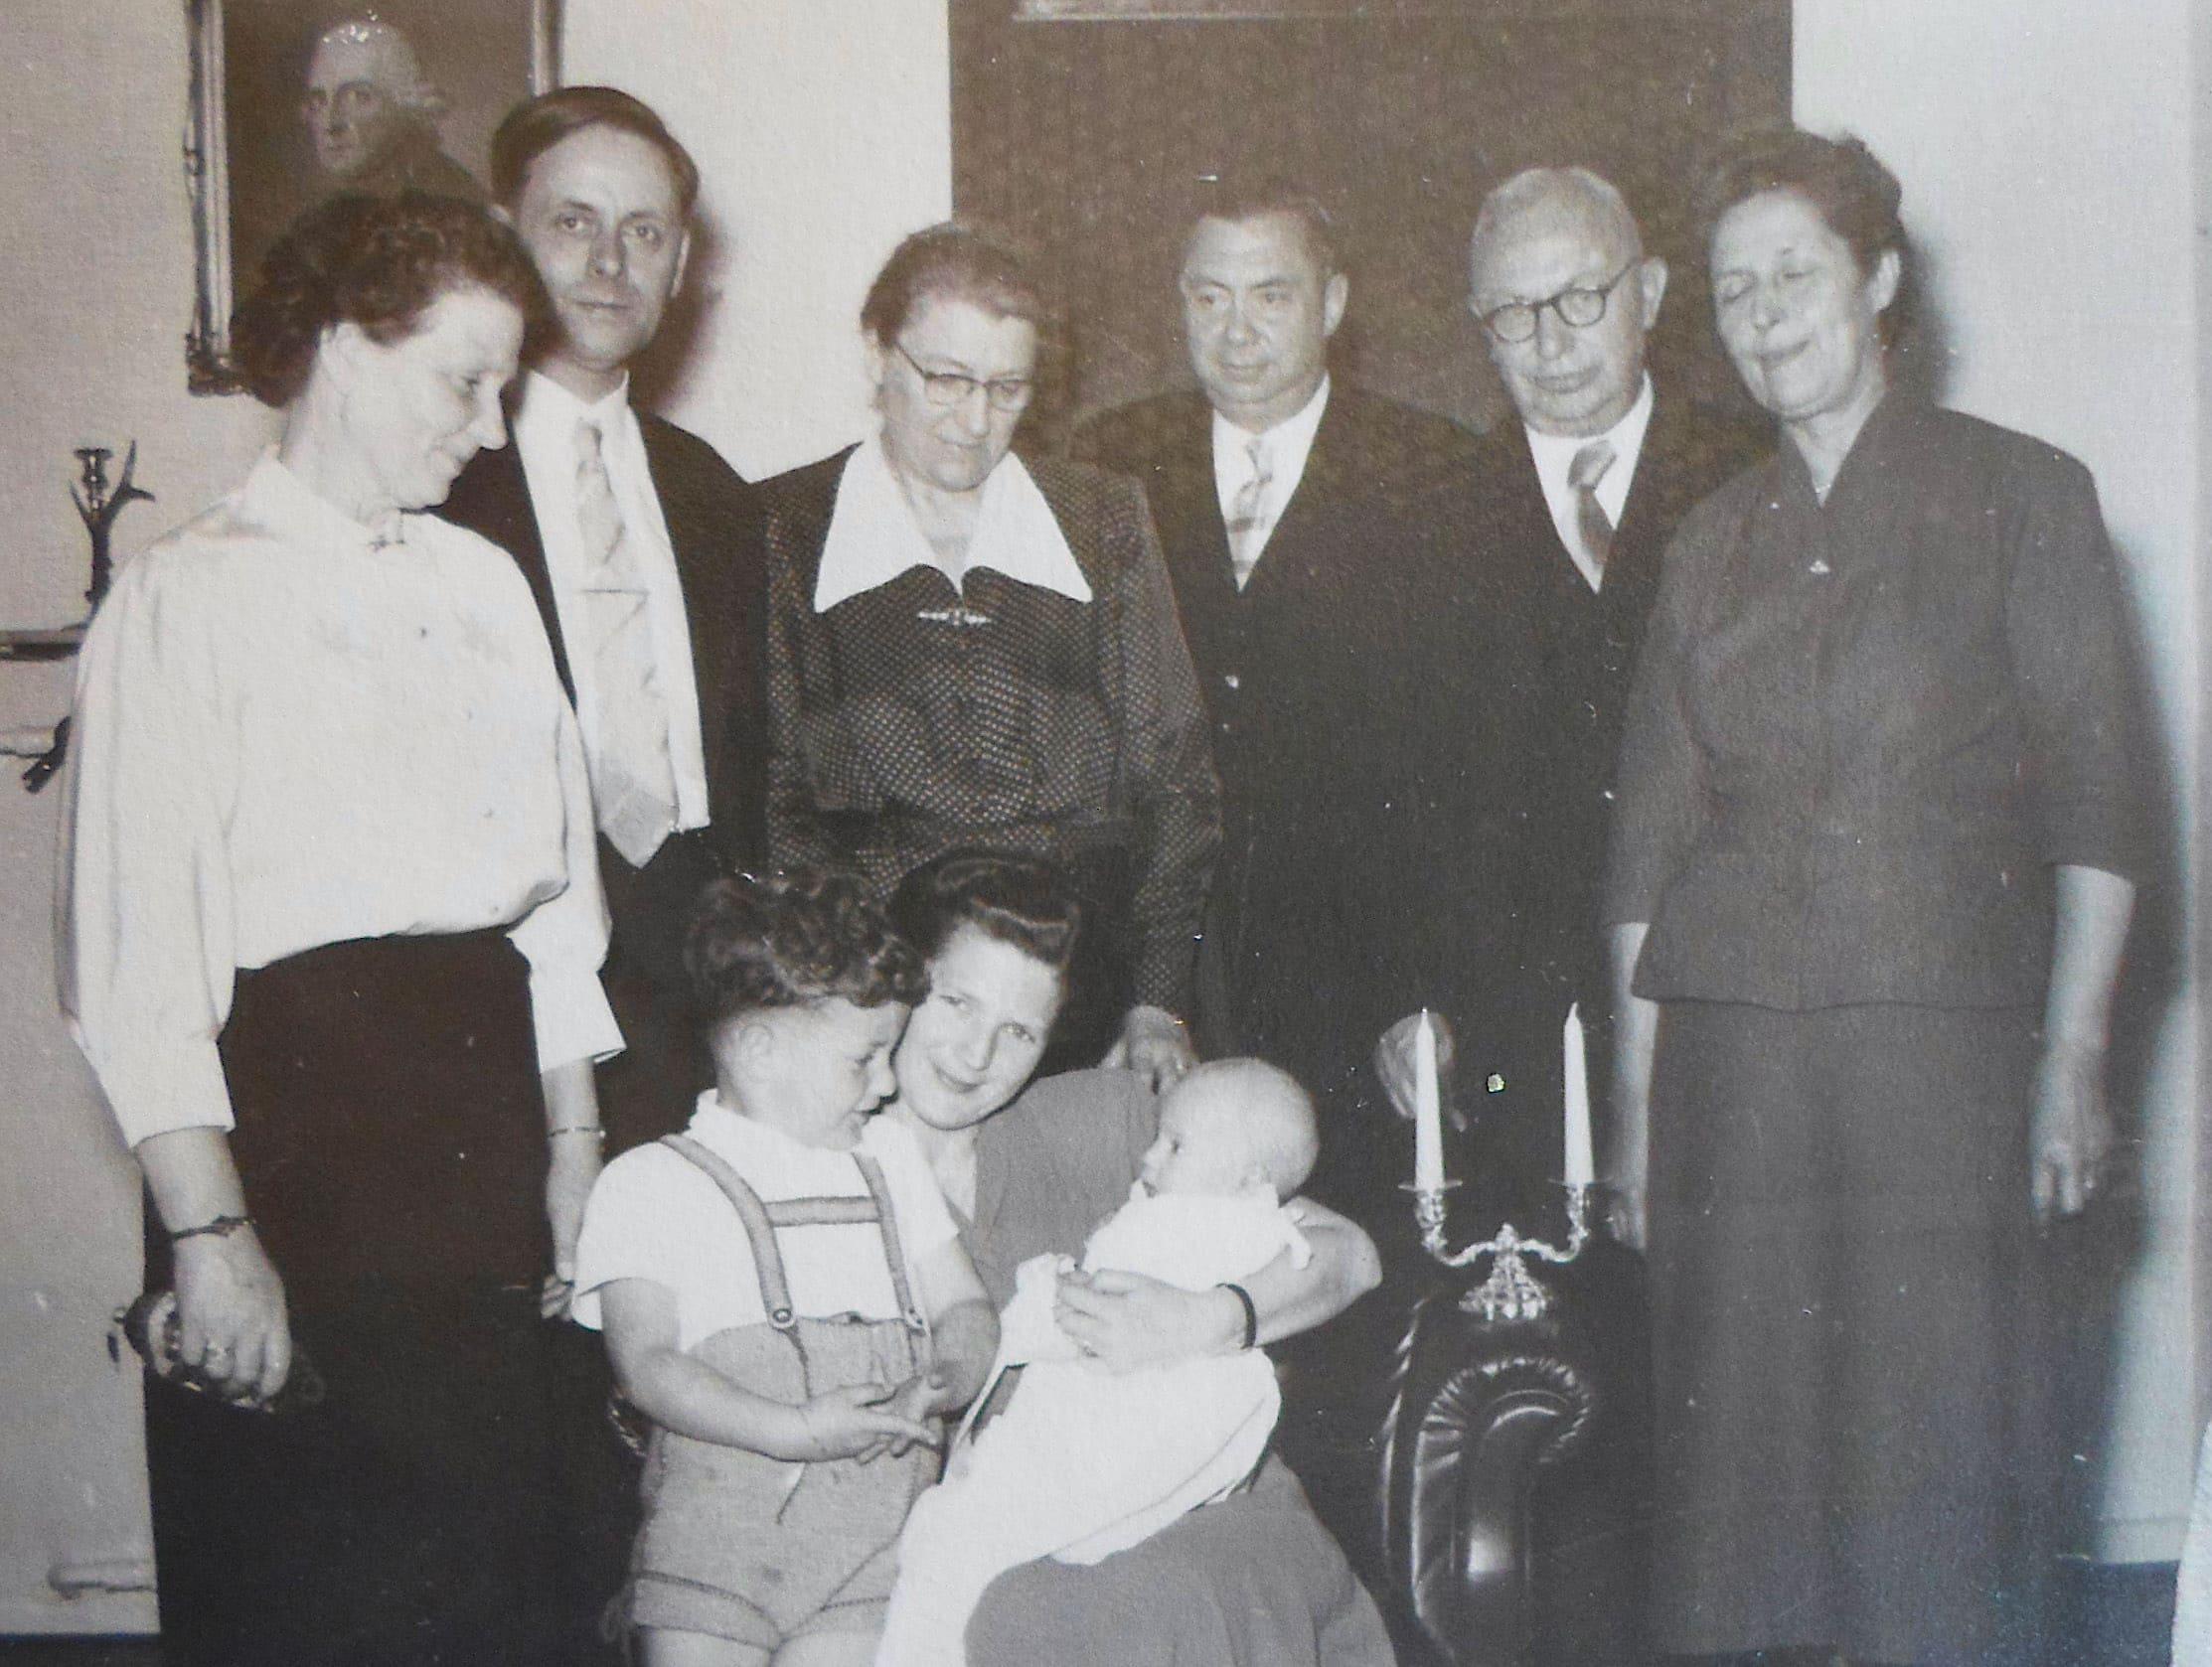 Thomas Wiegandt - Baptism Family Celebration - 1955